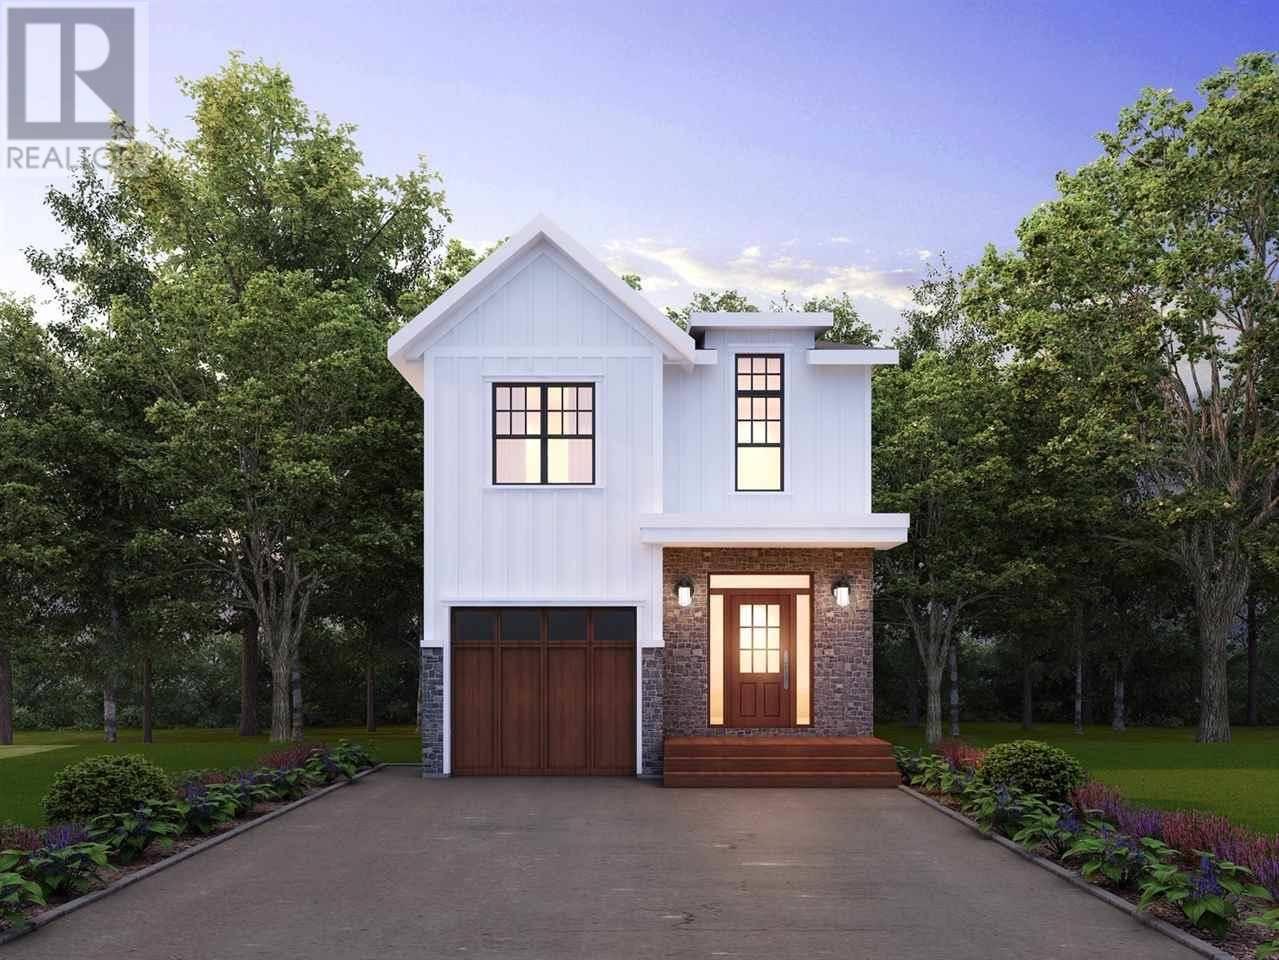 House for sale at 29 Darjeeling Dr Unit 424 Halifax Nova Scotia - MLS: 202002144